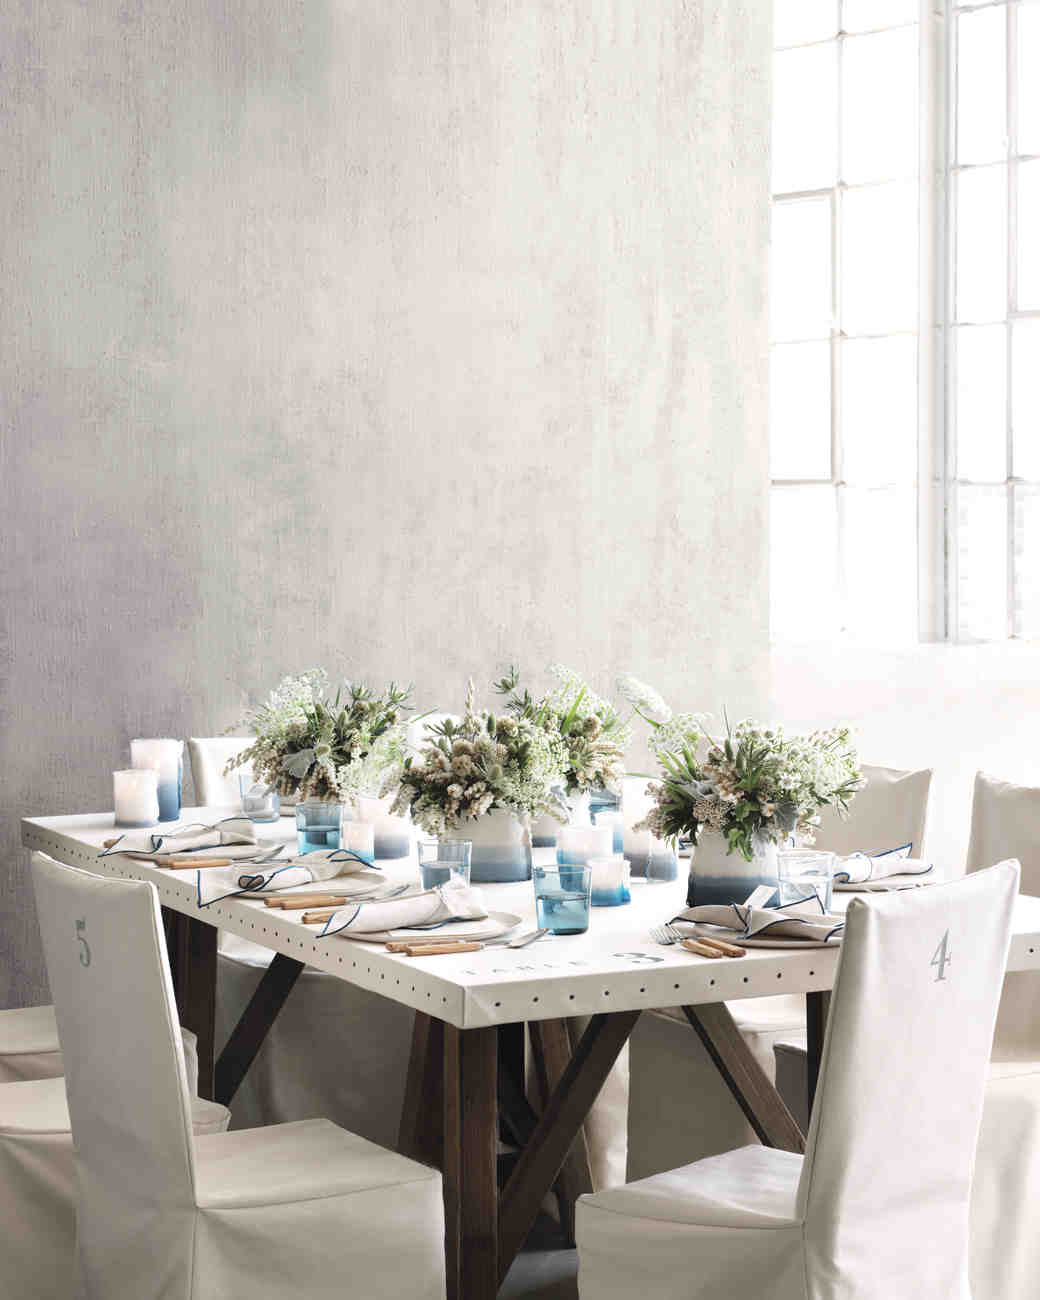 table-setting-0099-d111114.jpg